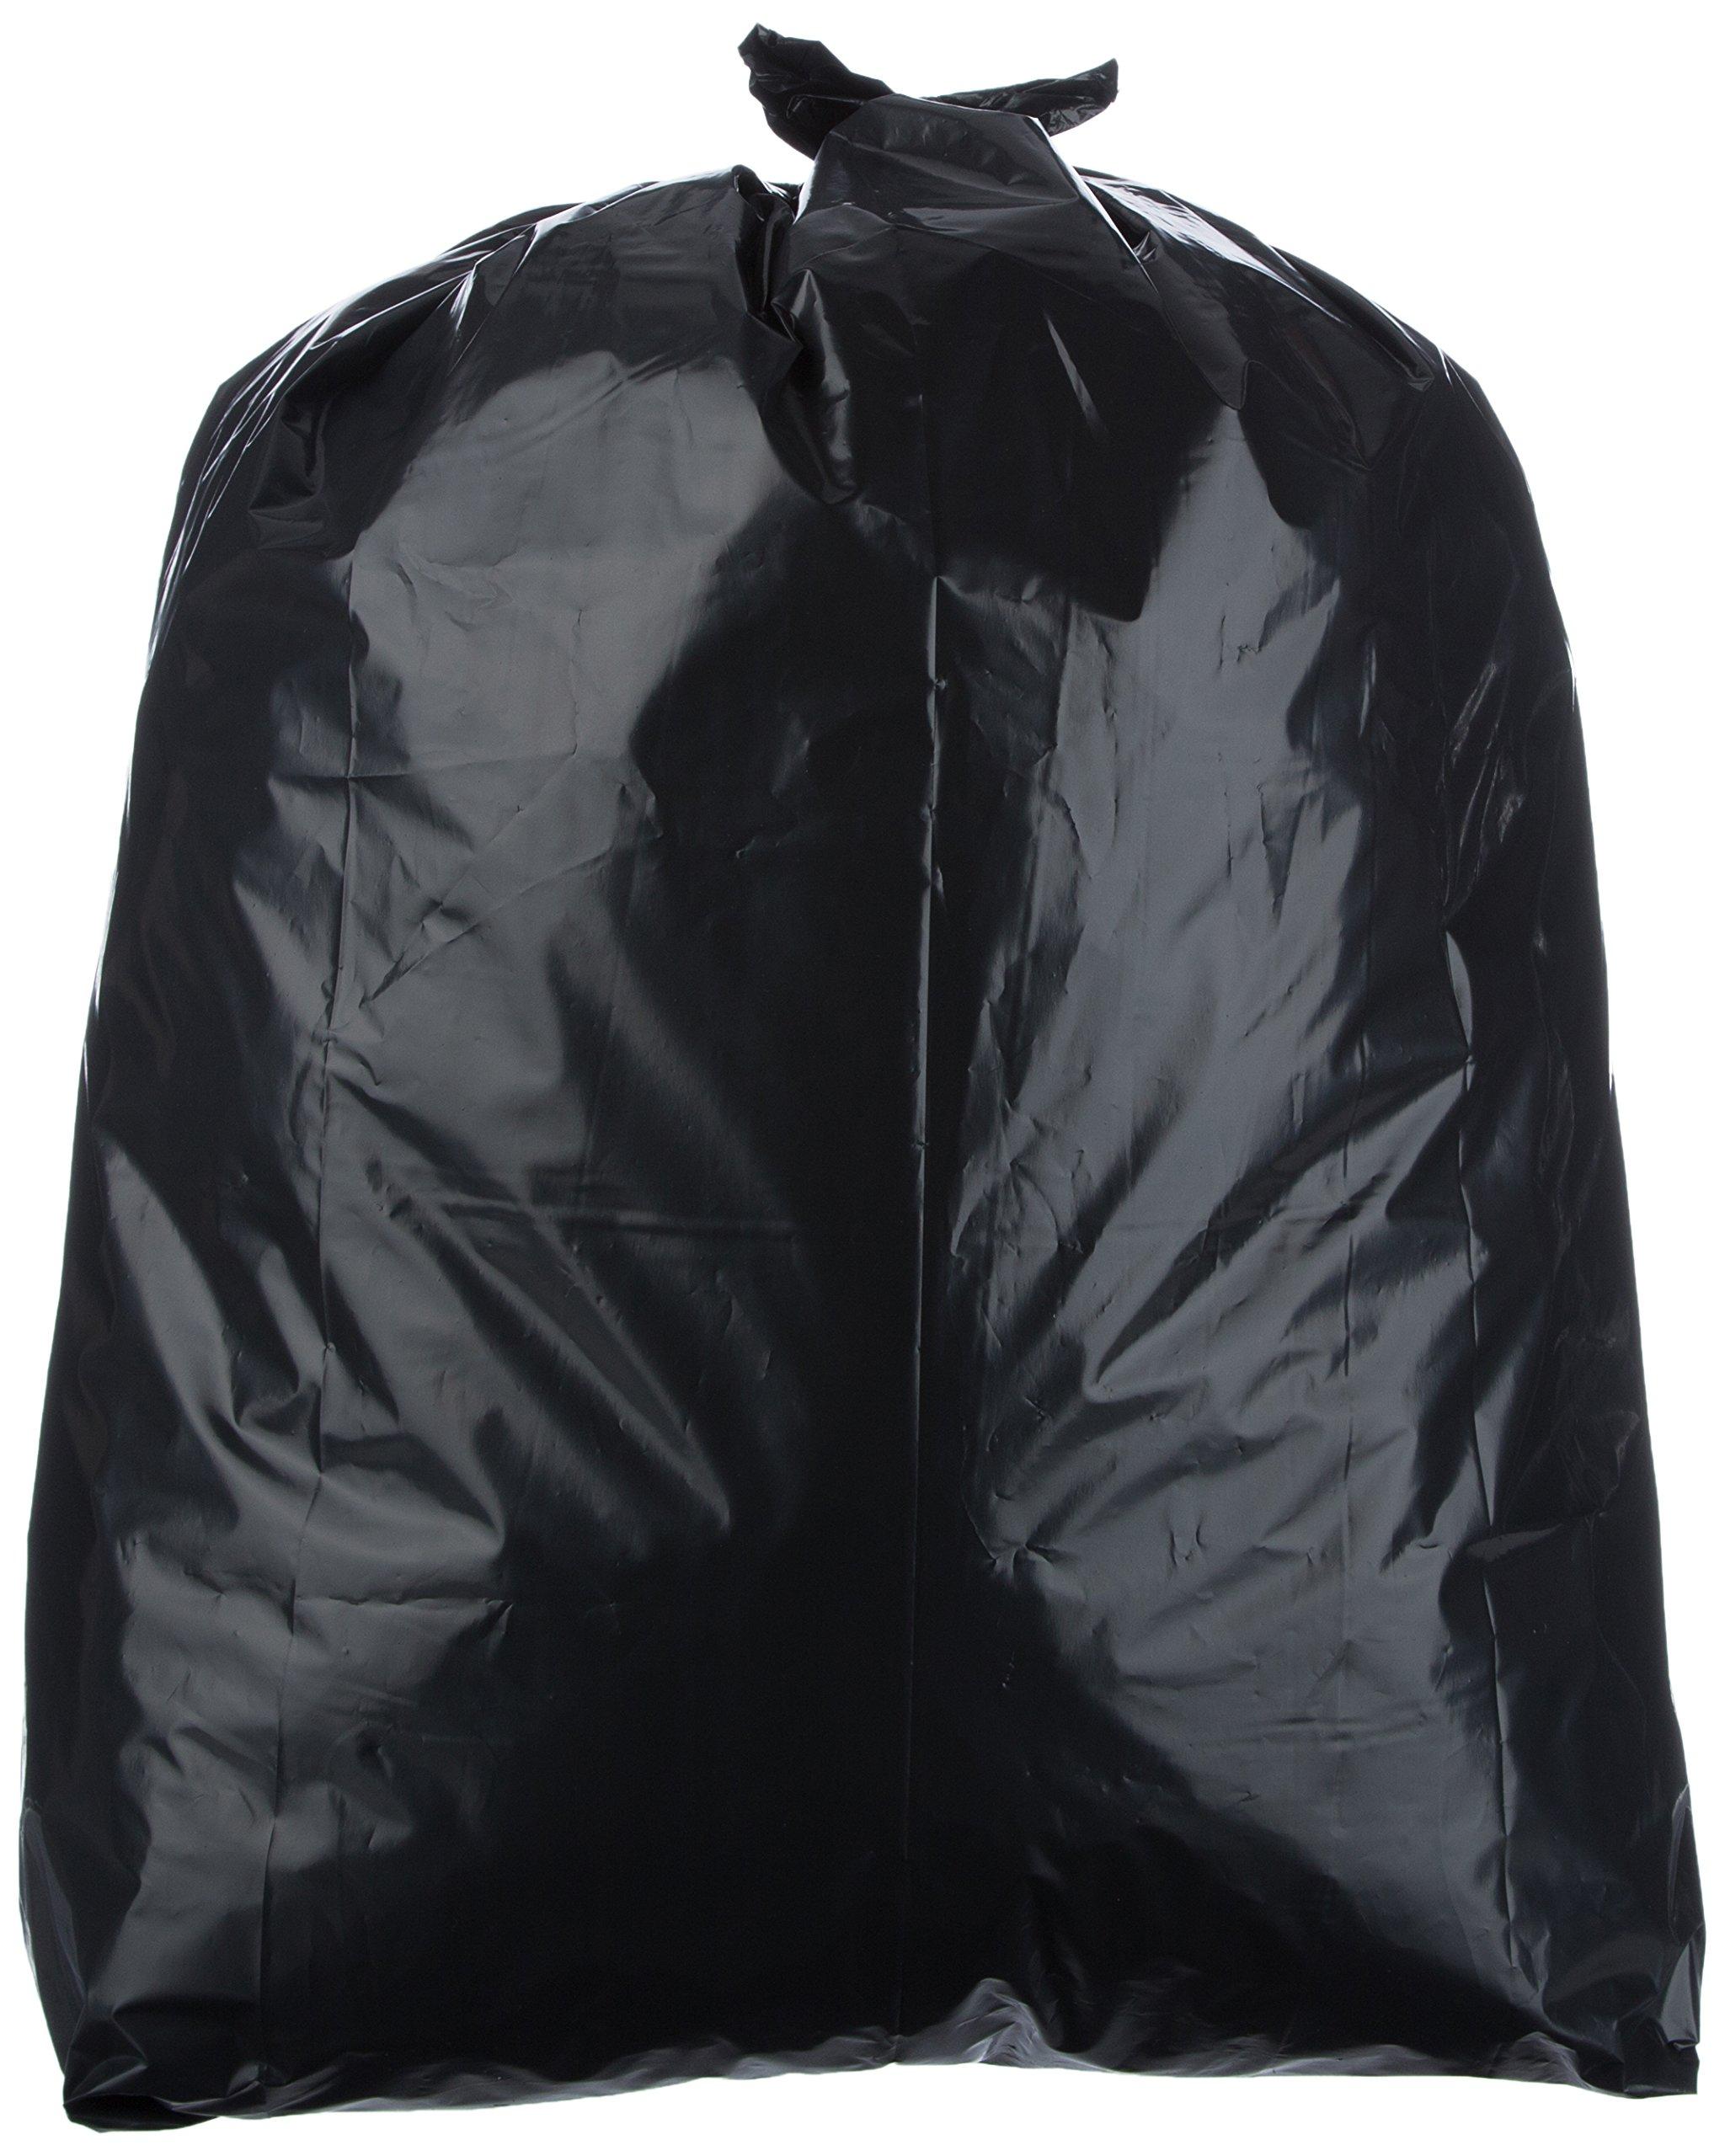 AmazonBasics 42 Gallon Contractor Trash Bag, 3 mil, Black, 75-Count